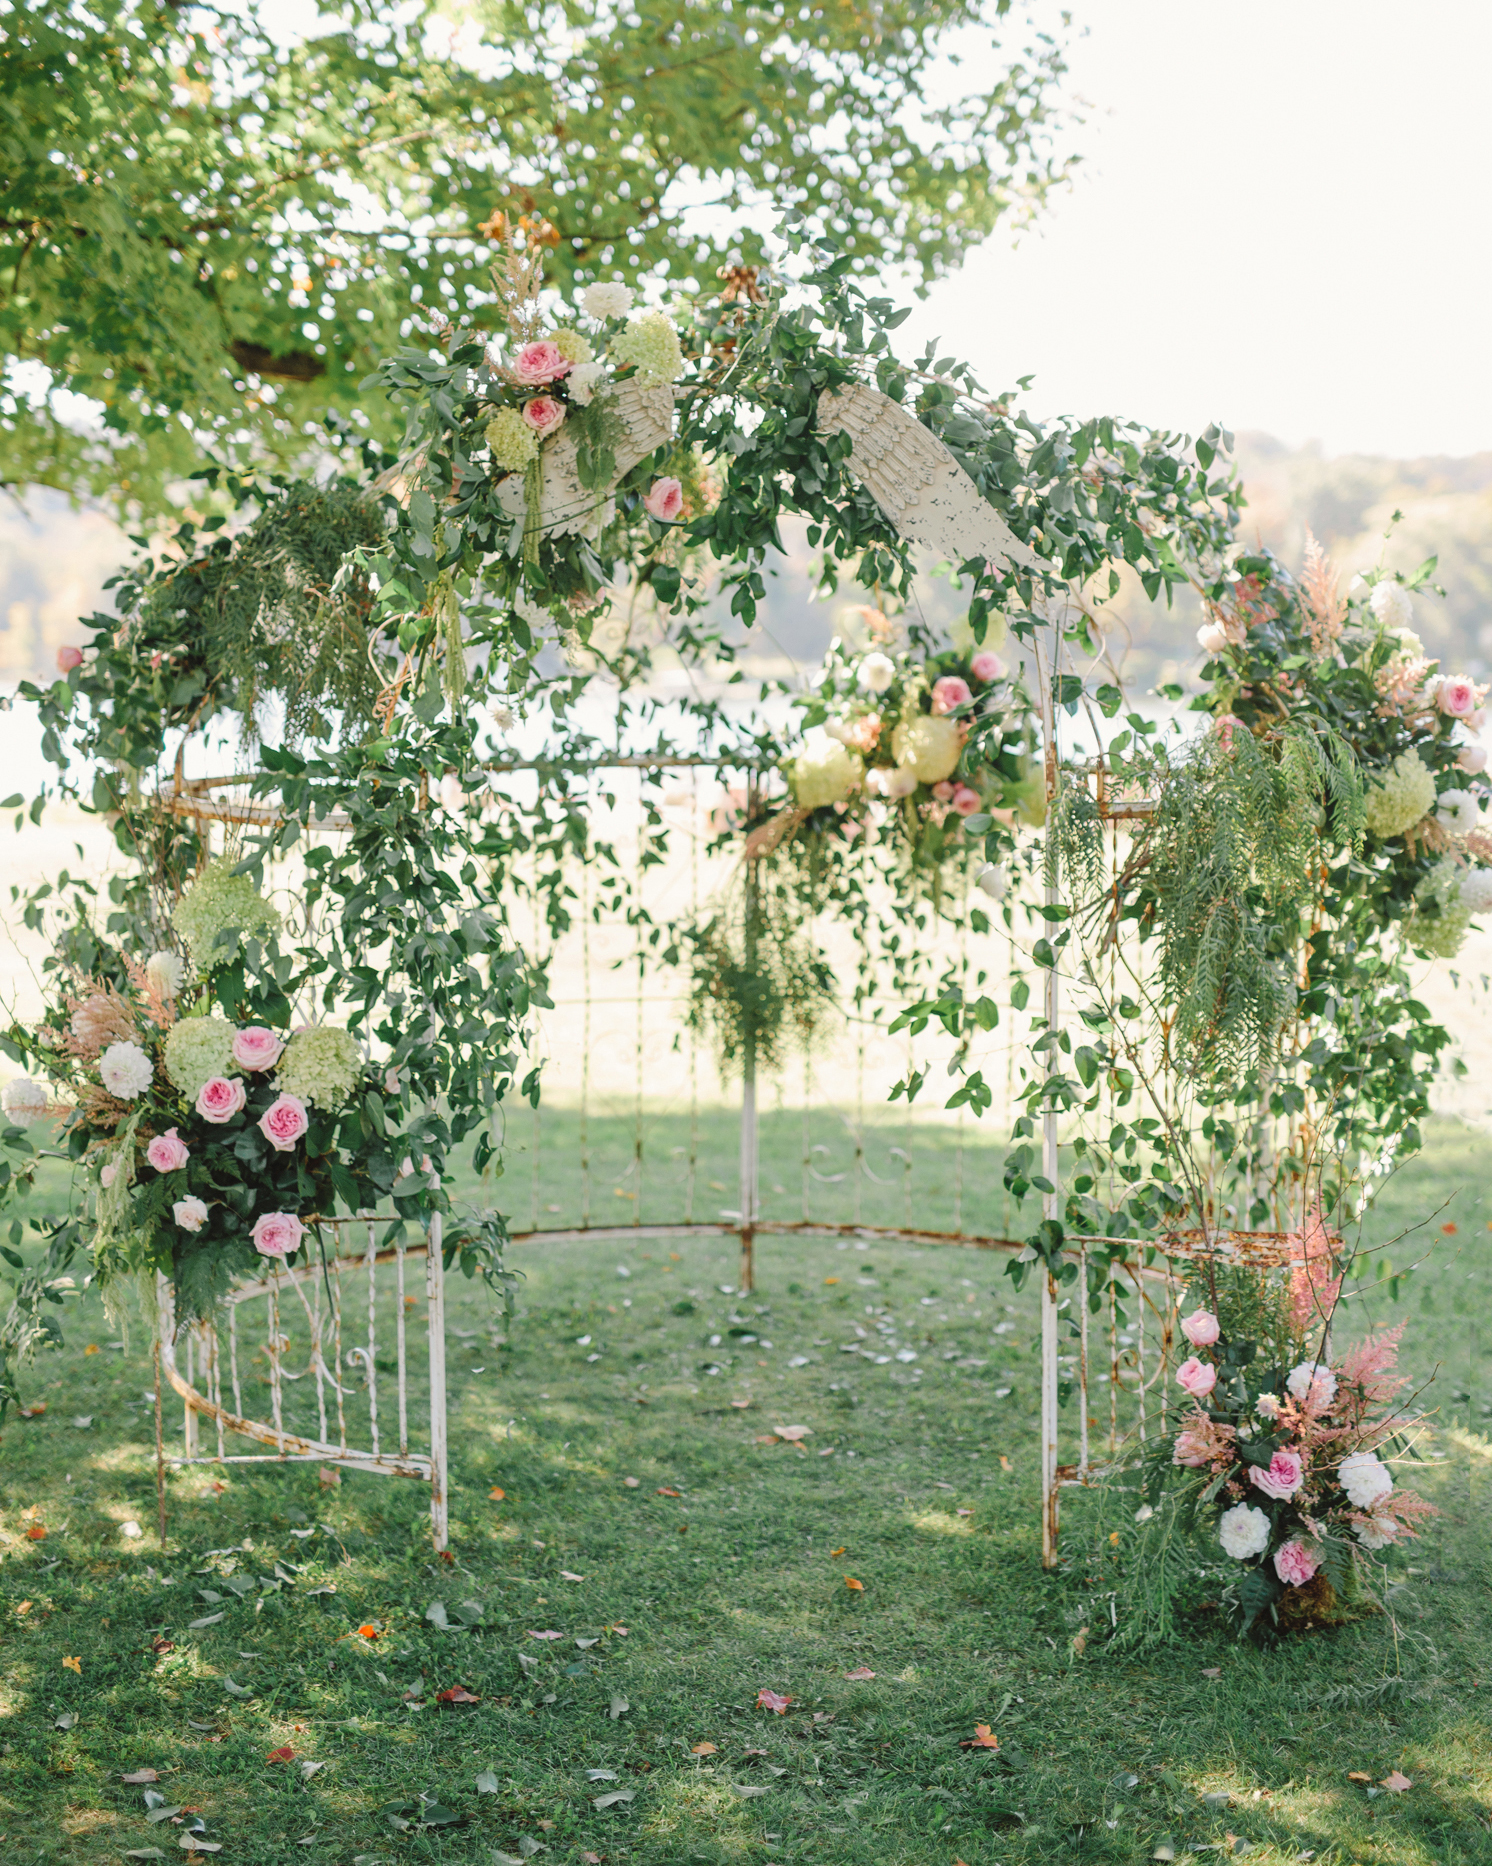 lizzy-bucky-wedding-ceremonystructure-250-s111857-0315.jpg